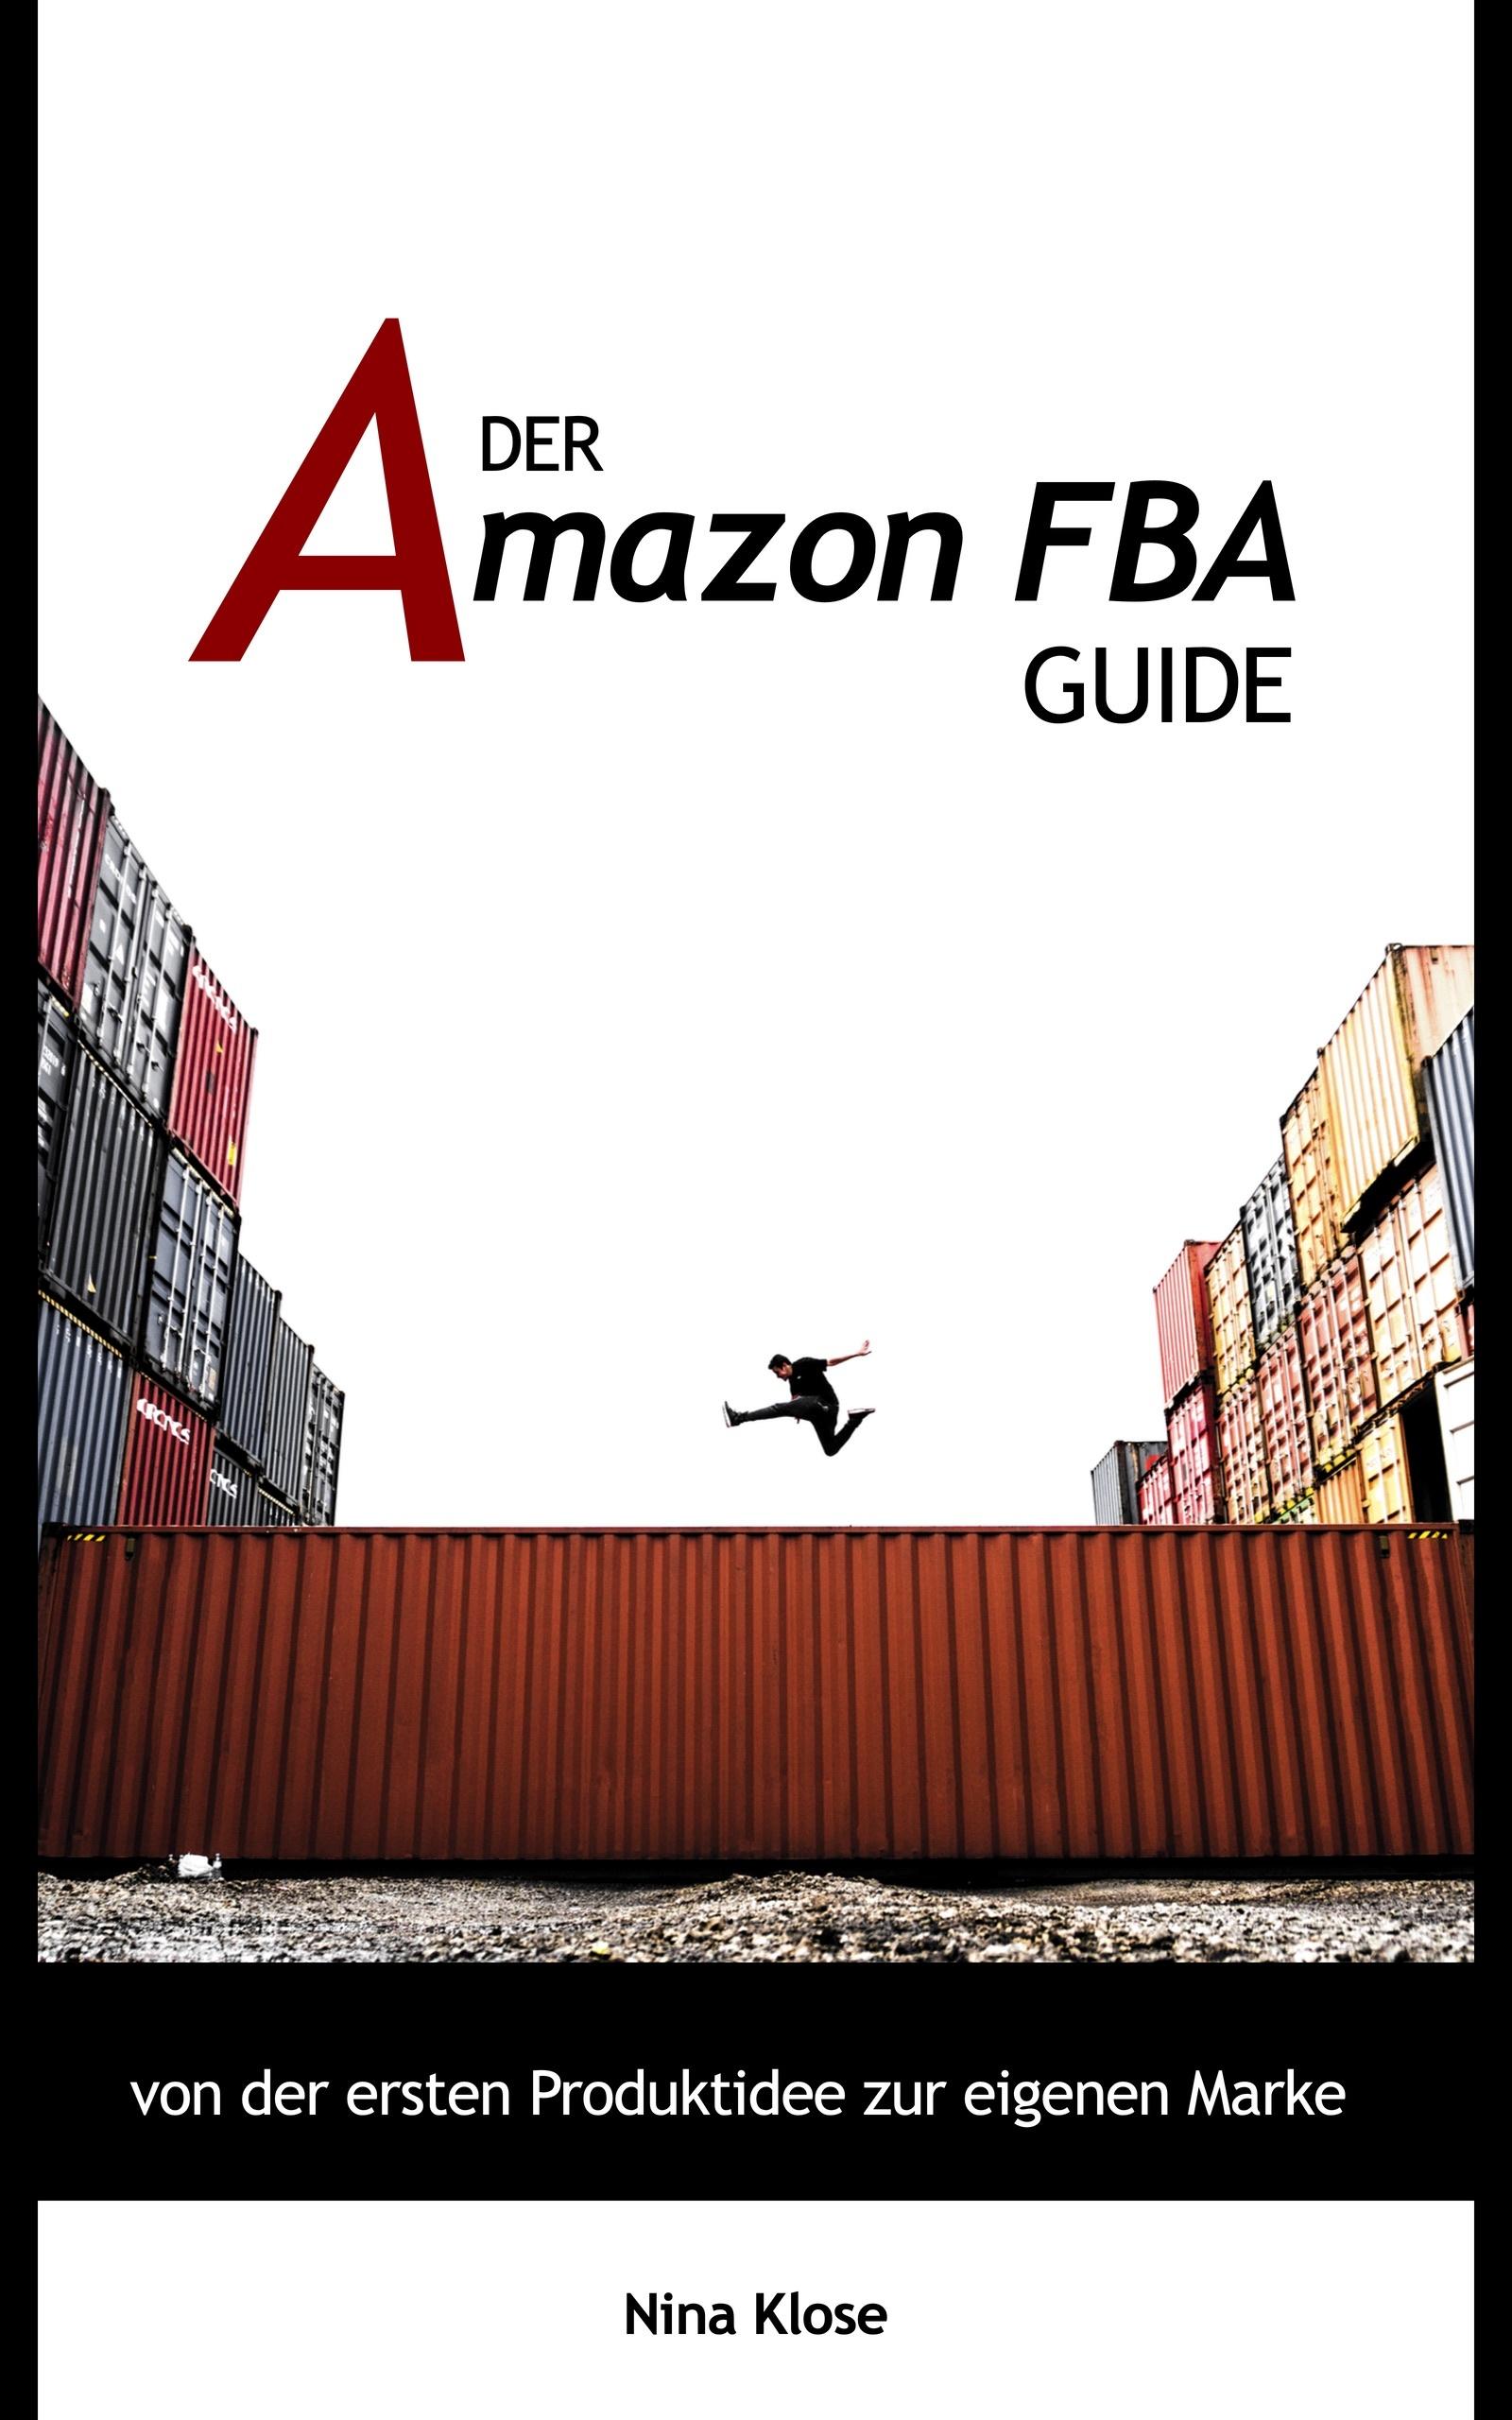 Der Amazon FBA Guide